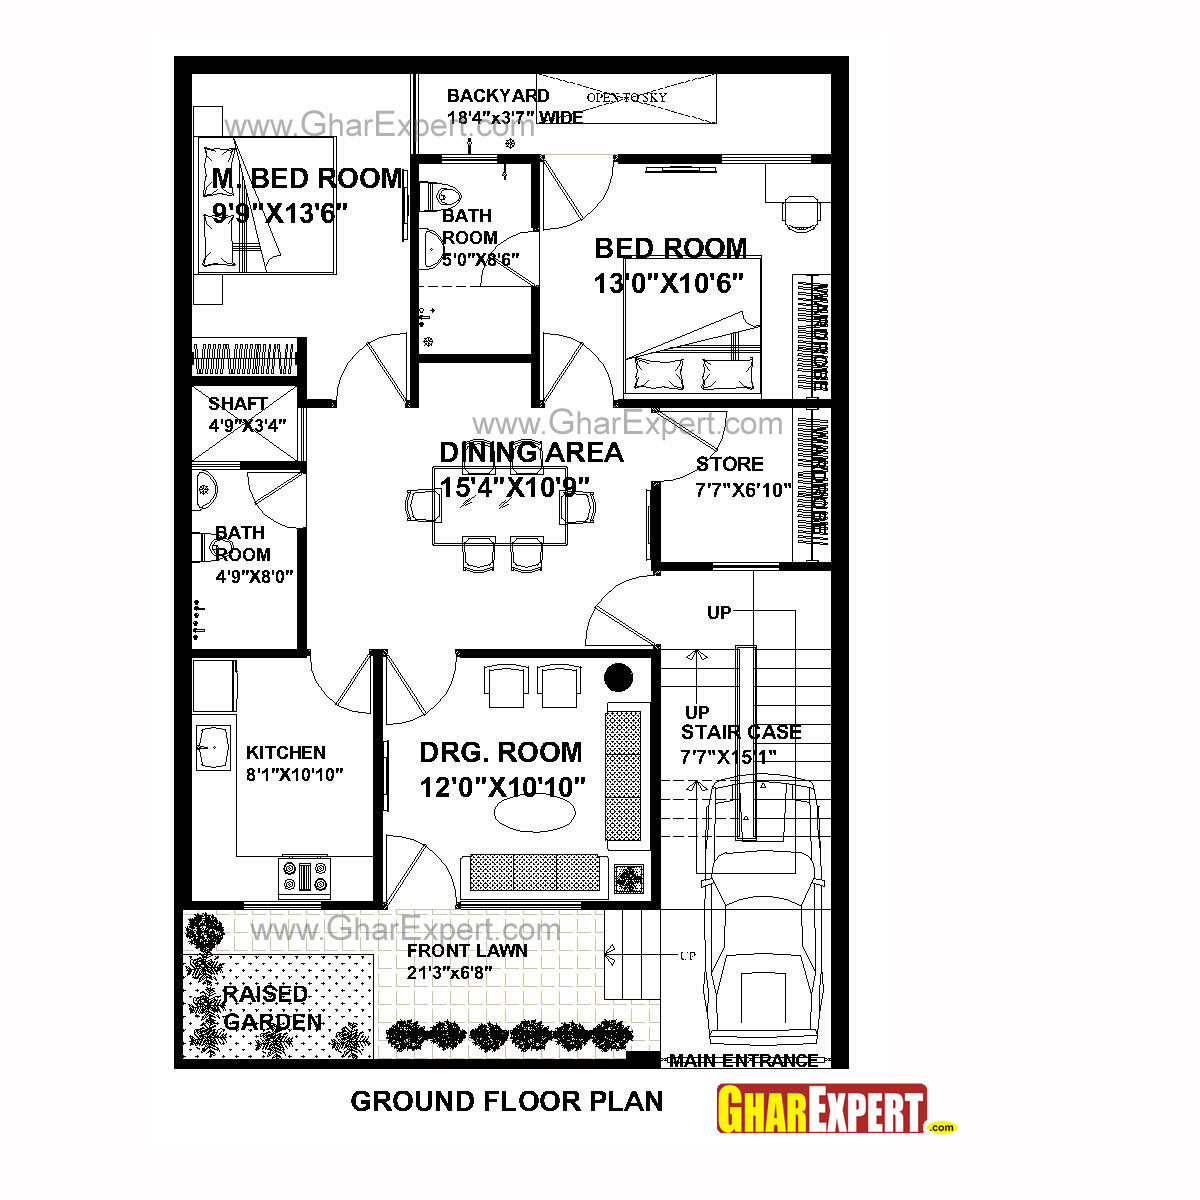 House Plan For 30 Feet By 45 Feet Plot Plot Size 150 Square Yards Gharexpert Com